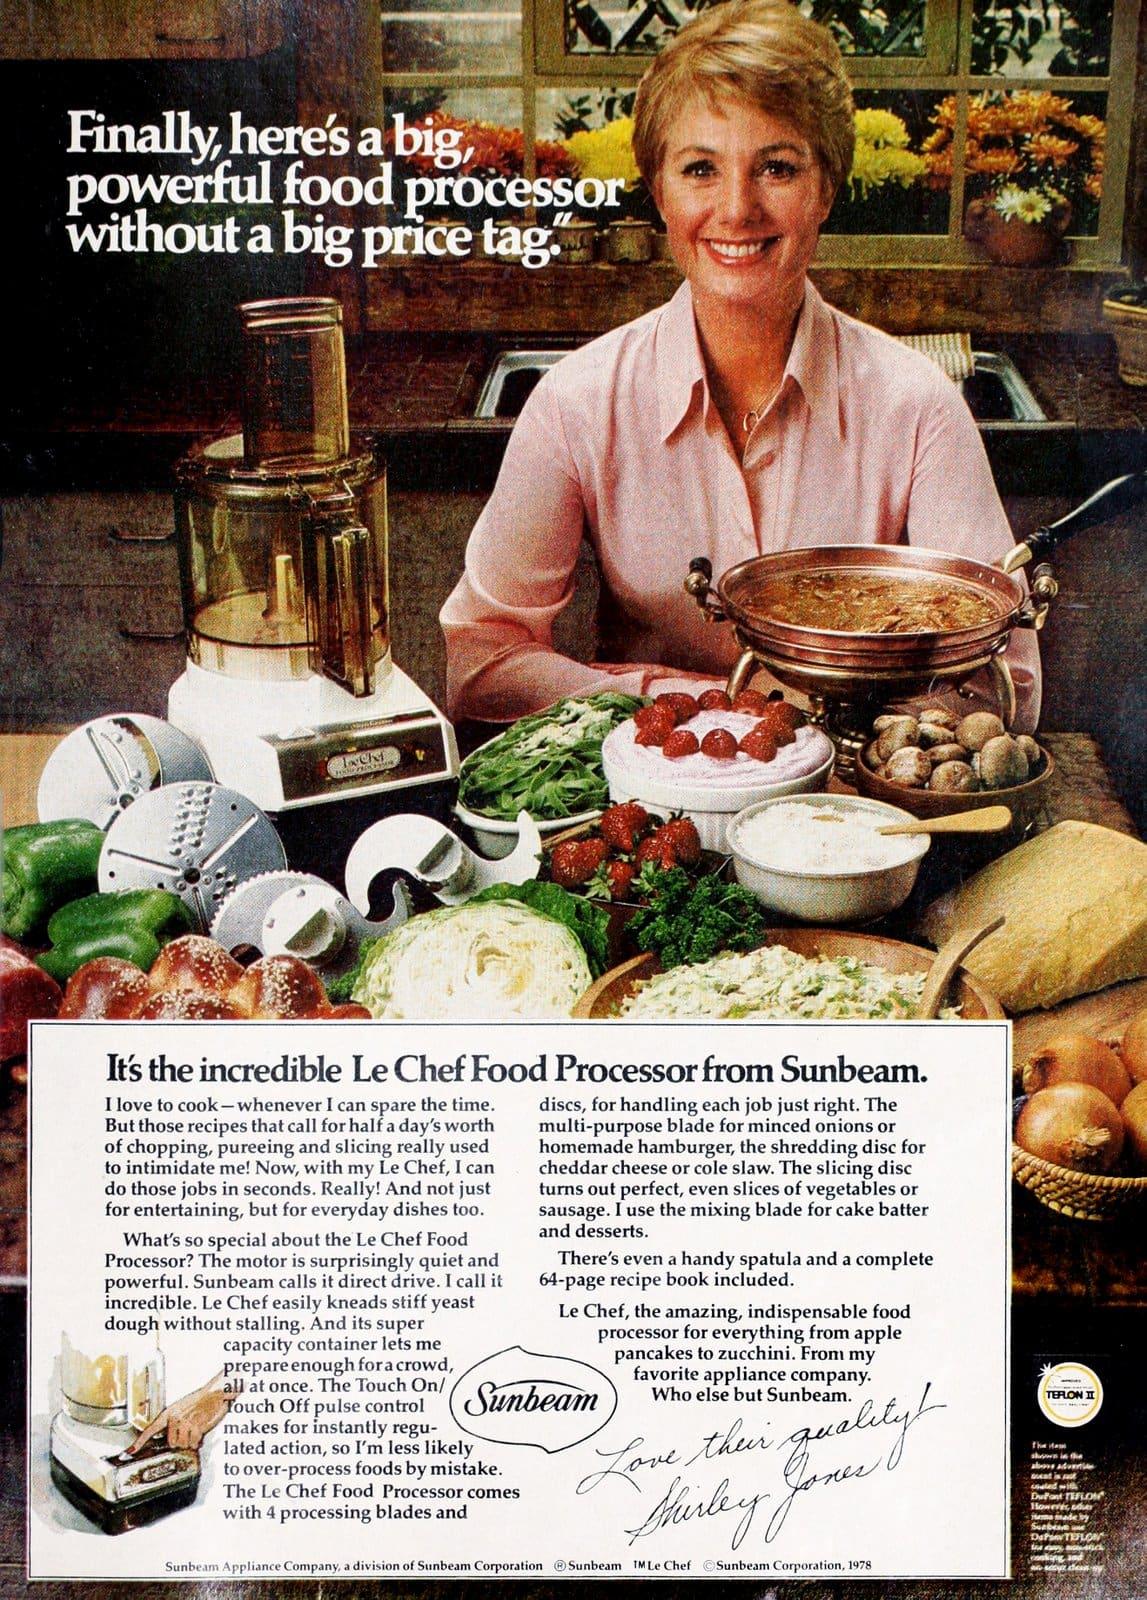 Sunbeam Le Chef food processor - Shirley Jones (1978)